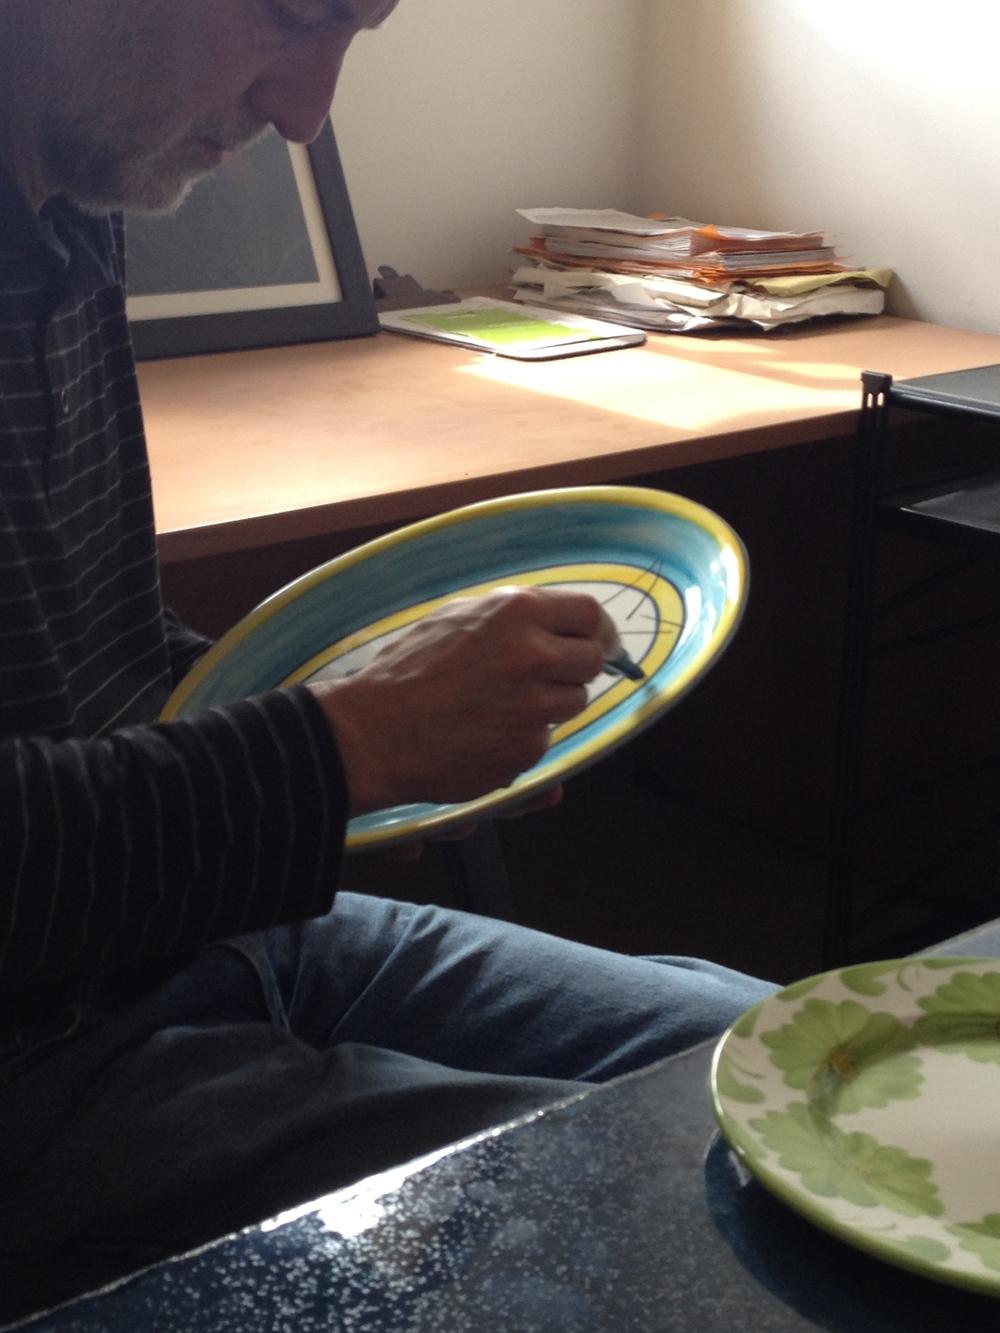 José Ignacio Adjusting the Platter Decoration